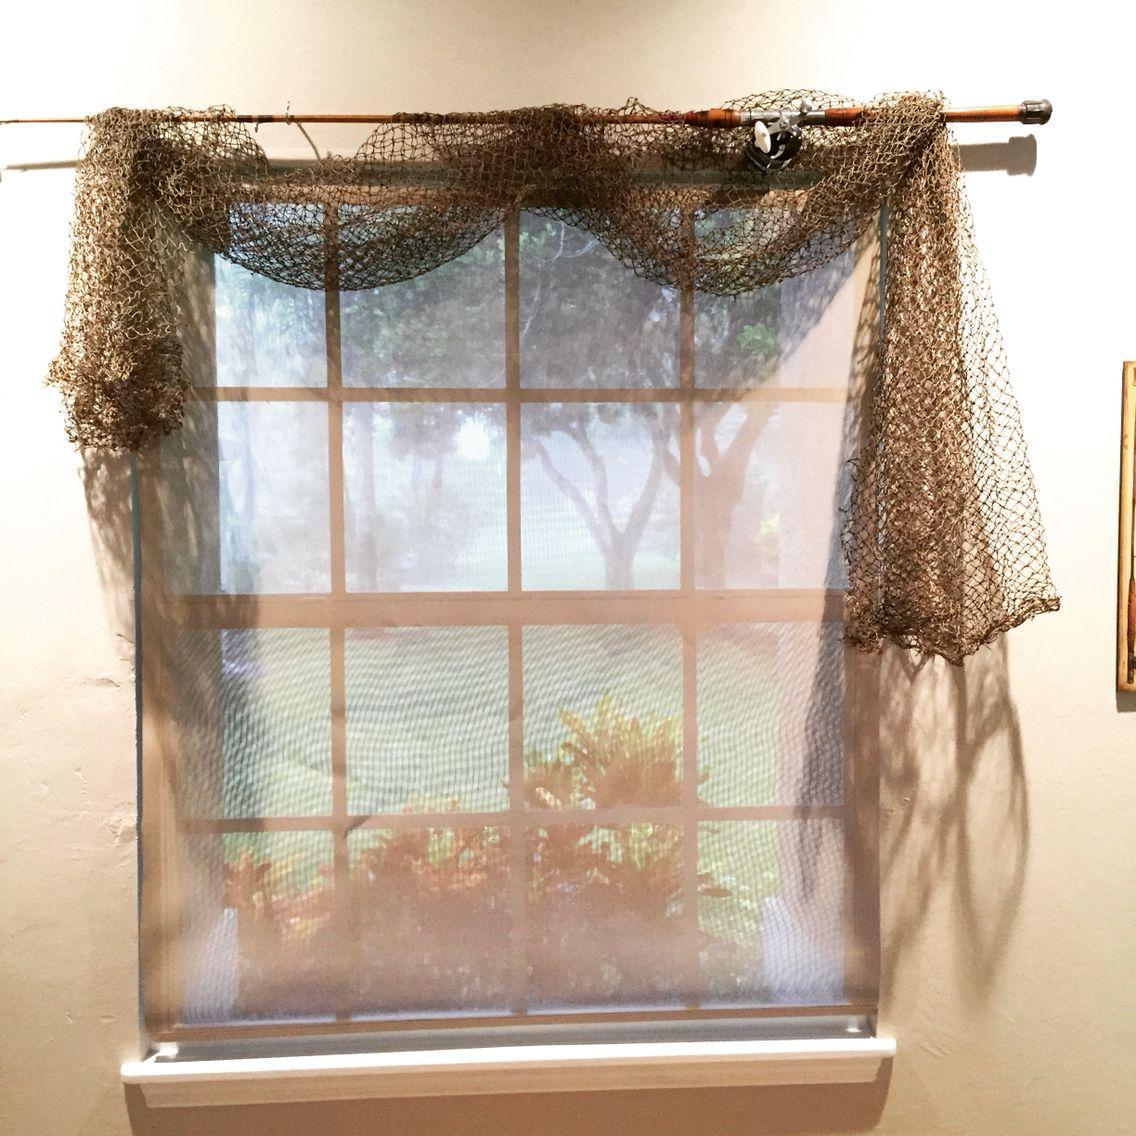 Decorative Fish Netting Fishing Pole Curtain Rod Fish Net Curtains Fishing Bedroom Decor